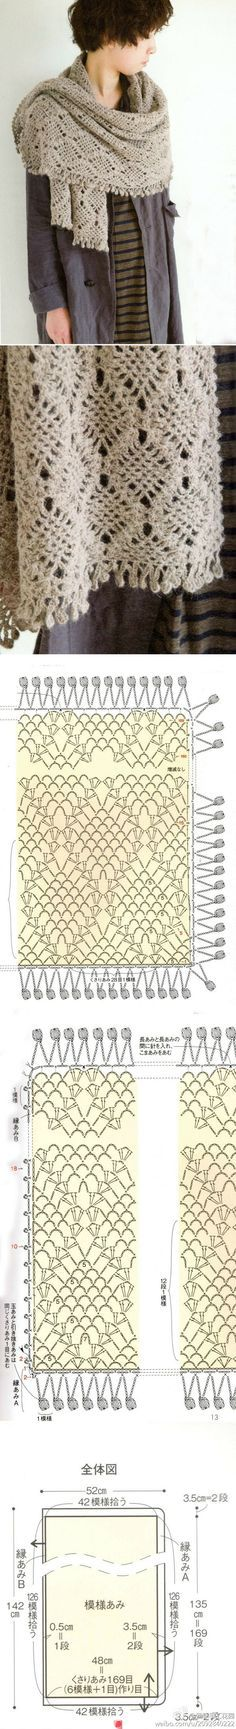 #crochet, free chart, diagram, shawl, wrap, #haken, gratis haakschema, sjaal, shawl, stola, #haakpatroon